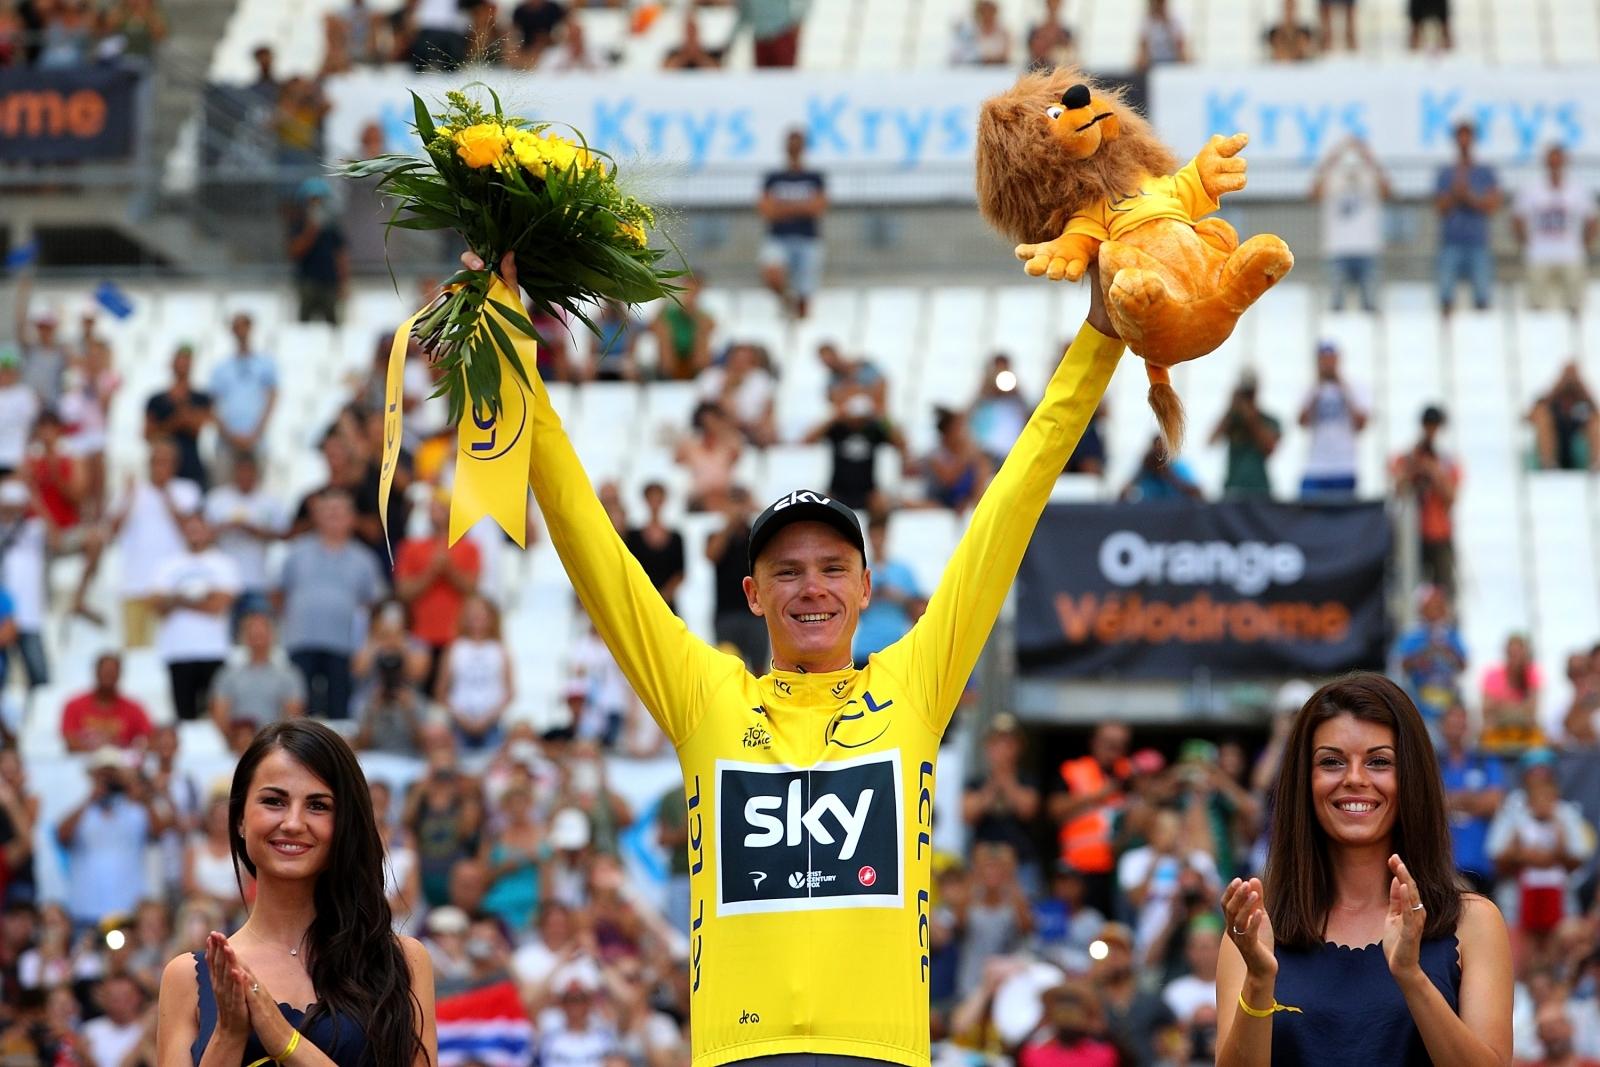 Eddy Merckx Tour De France Wins